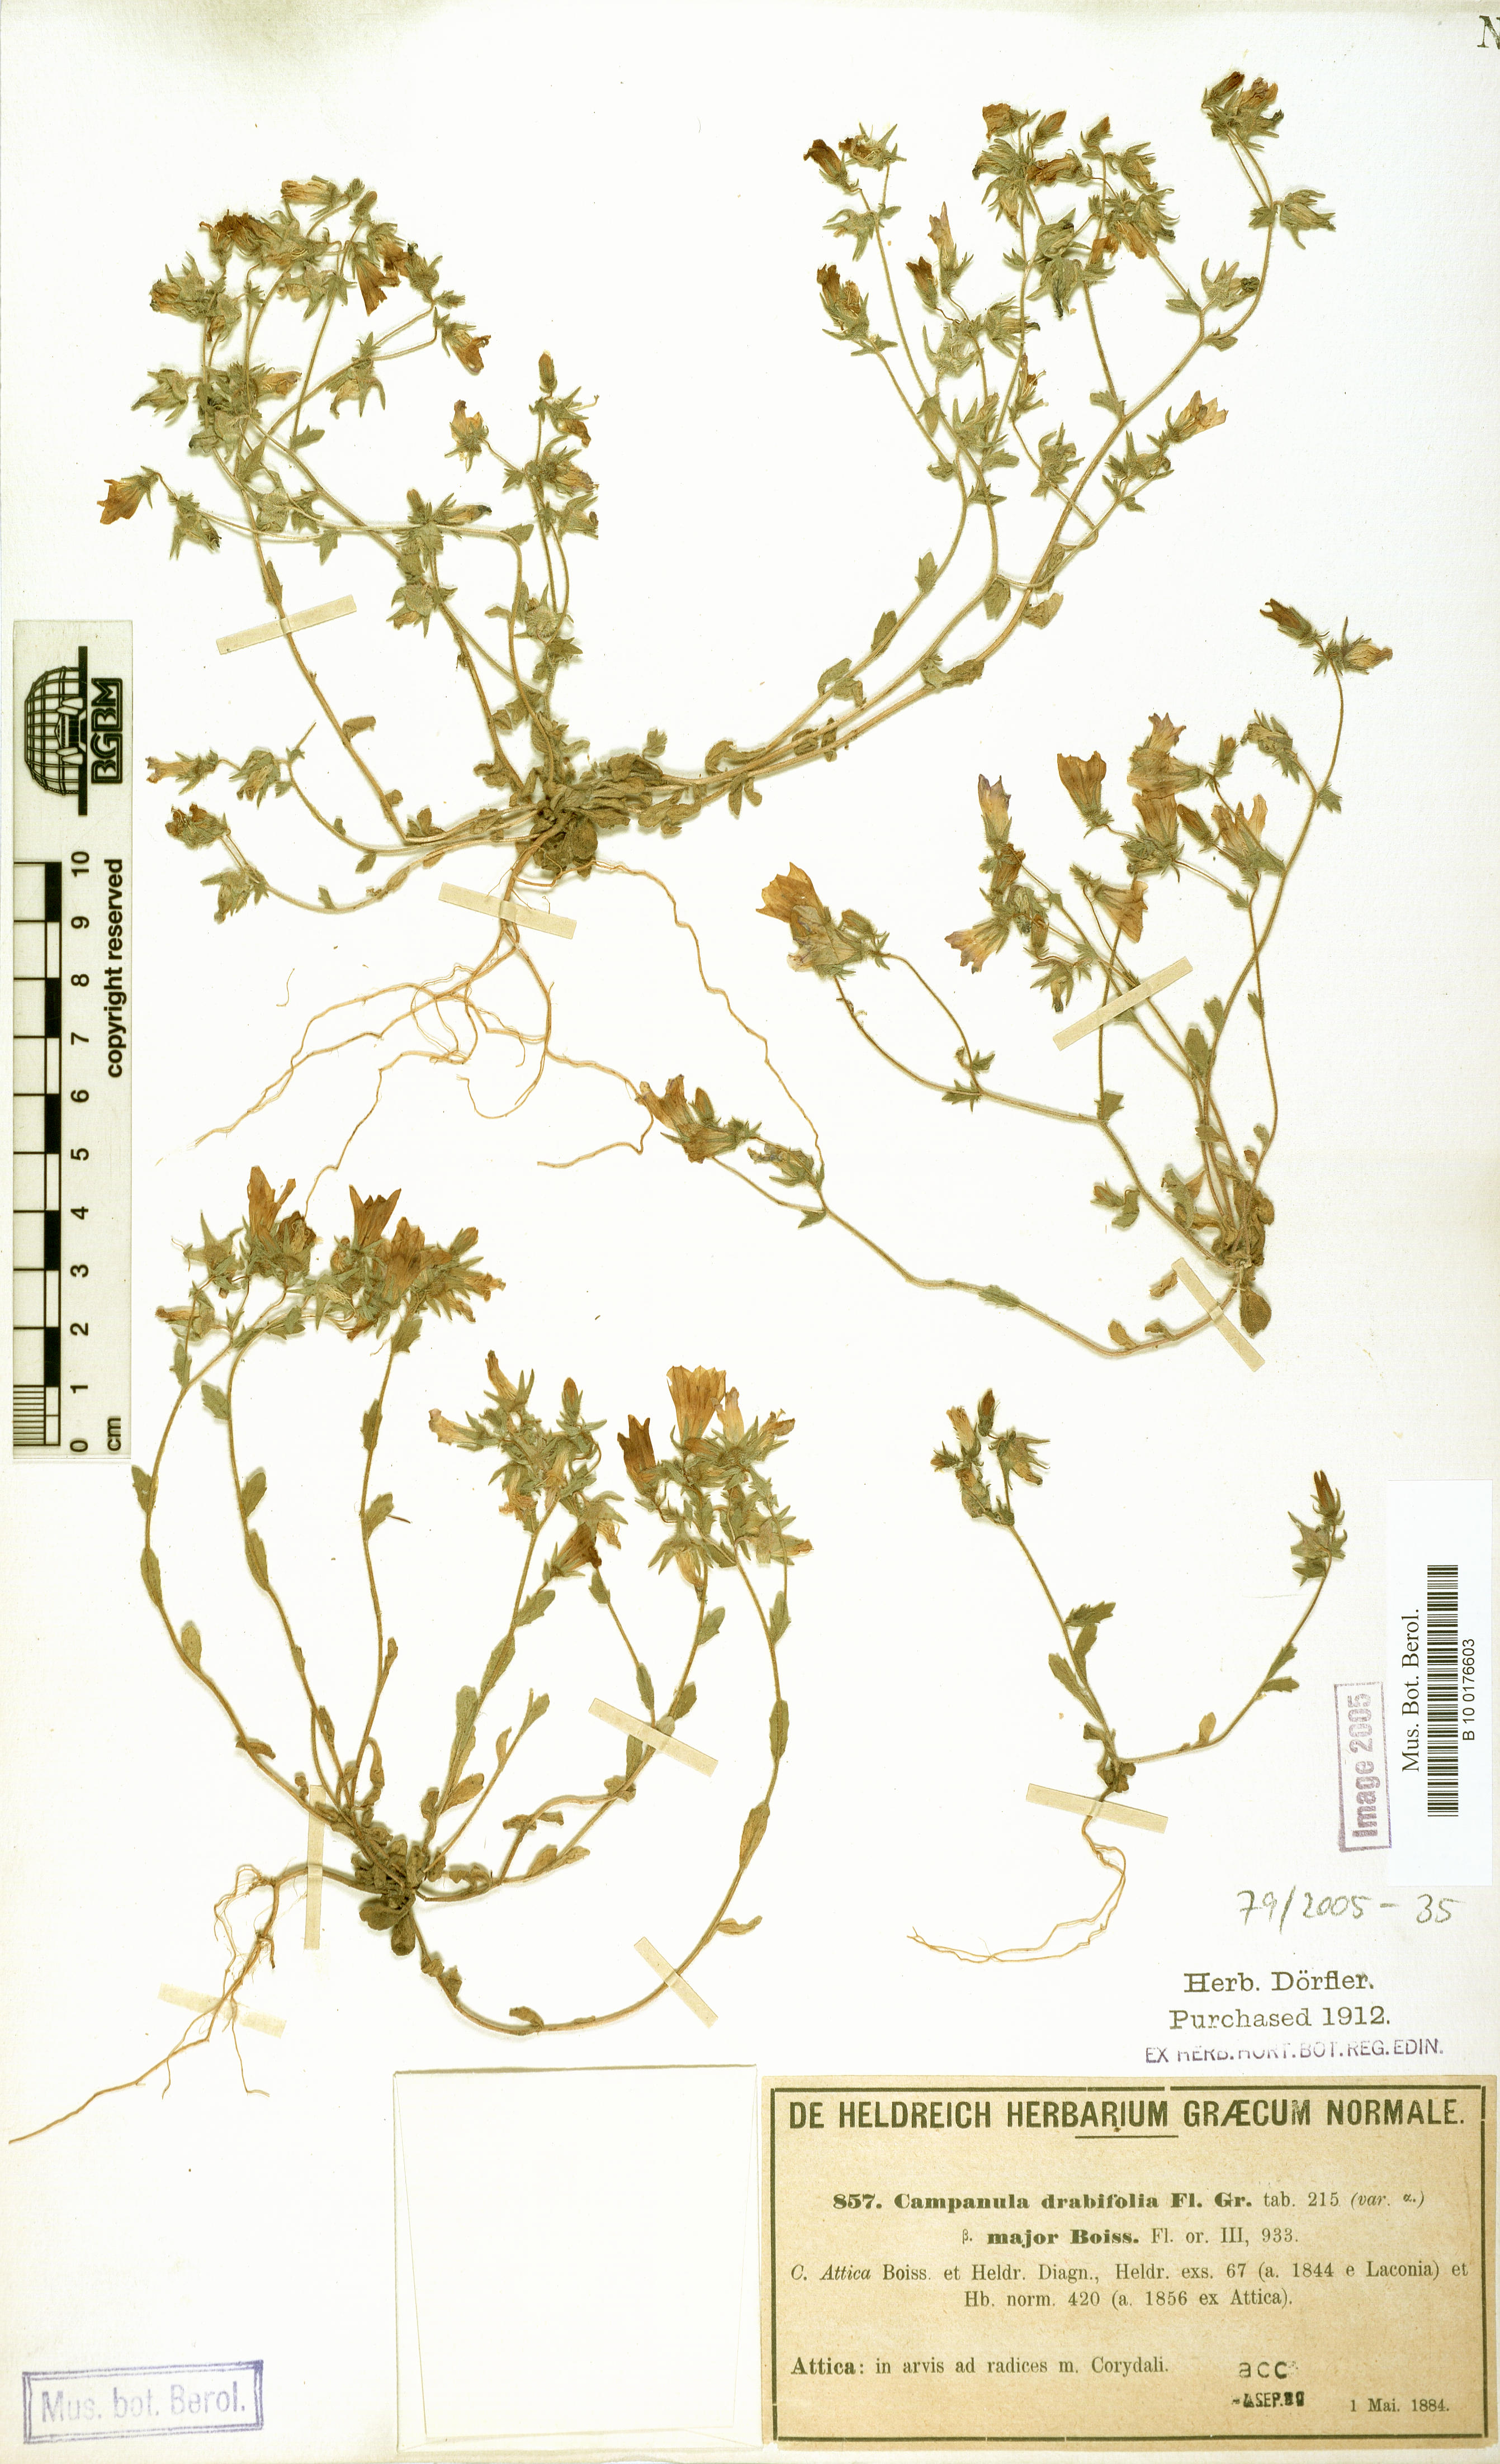 http://ww2.bgbm.org/herbarium/images/B/10/01/76/60/B_10_0176603.jpg